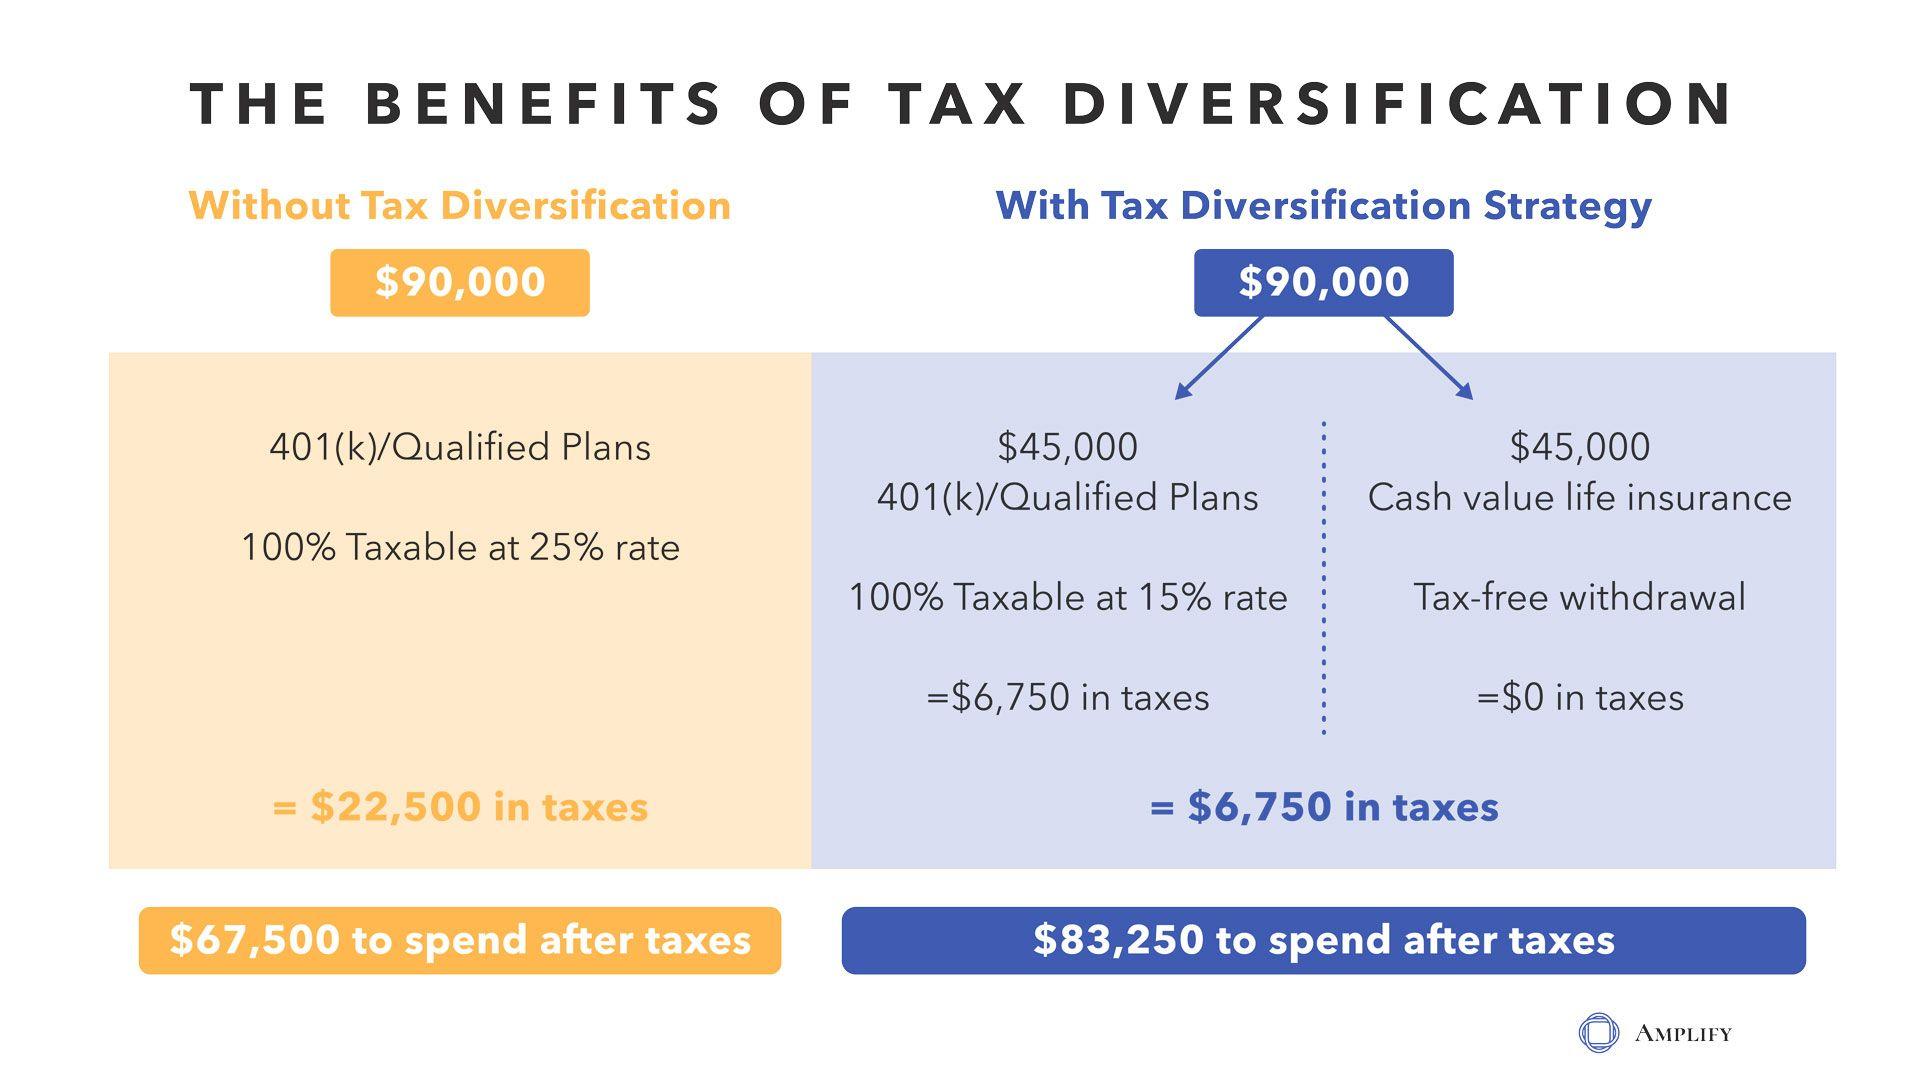 Amplify_Blog_2_Graphic-Tax-Diversification-Benefits.jpg